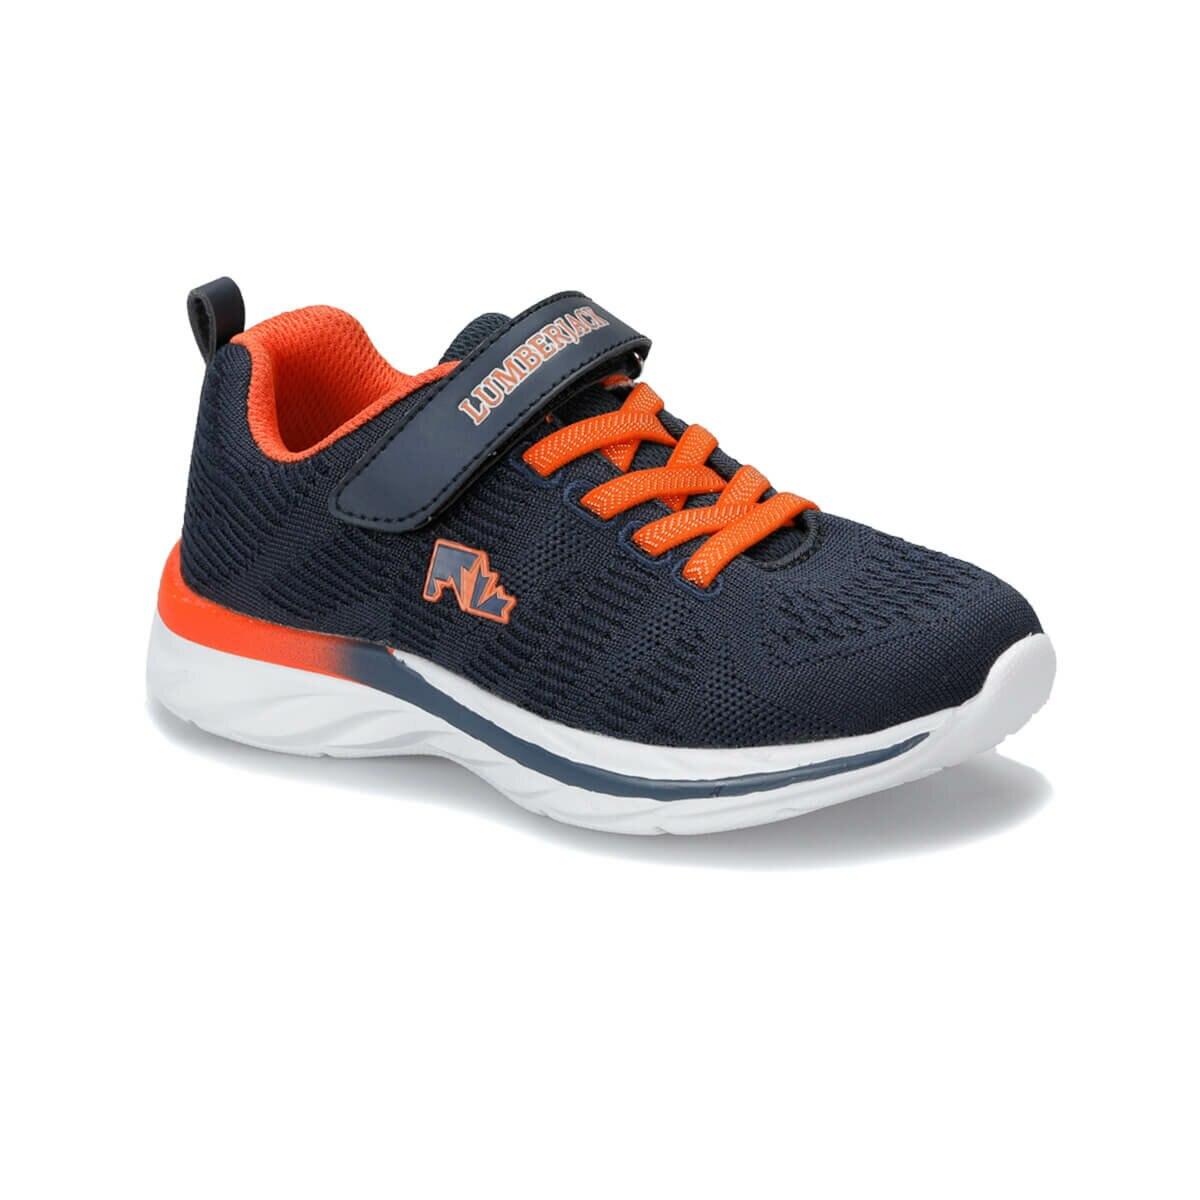 FLO SHARE Navy Blue Male Child Running Shoes LUMBERJACK